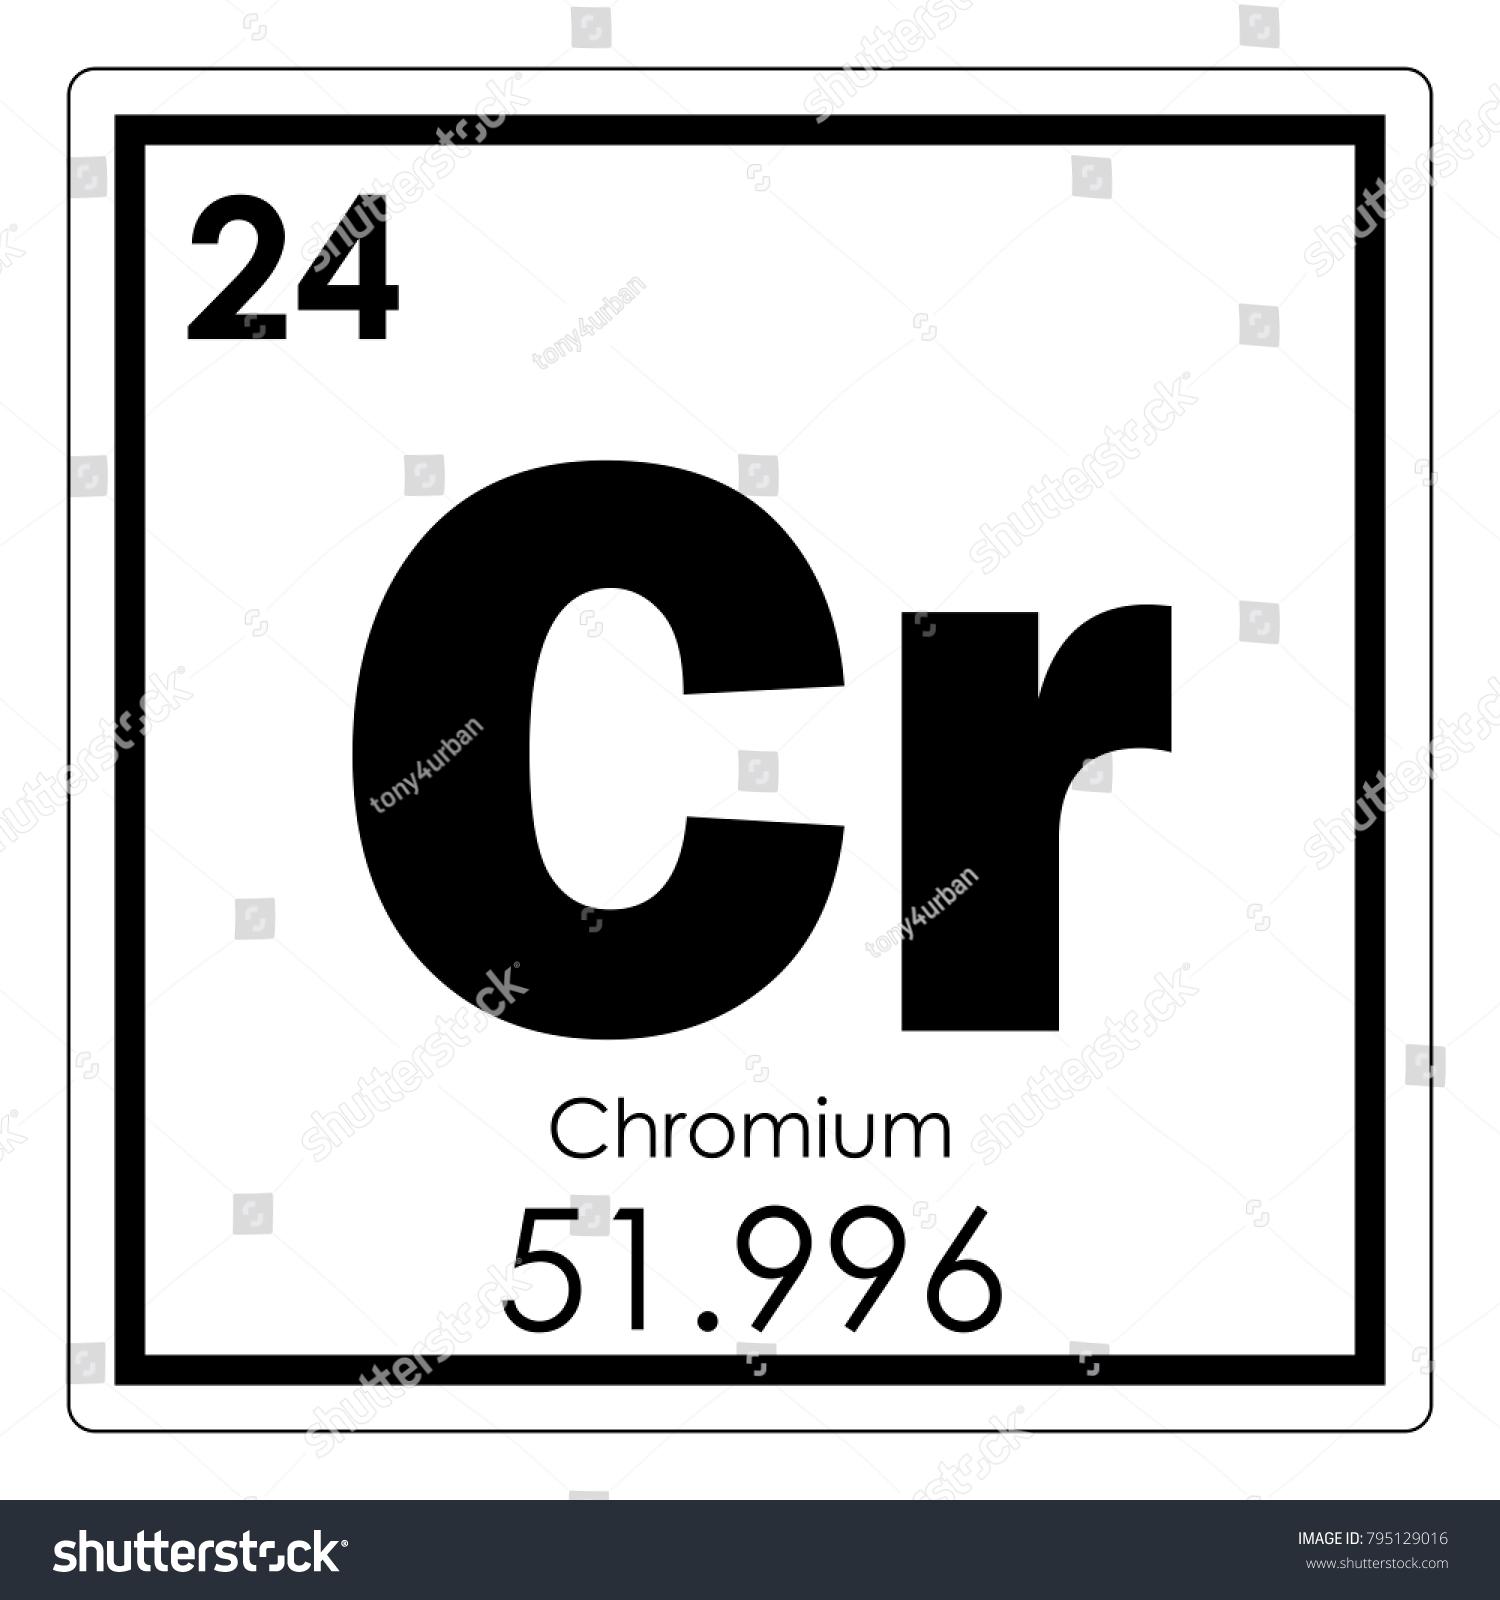 Chromium chemical element periodic table science stock illustration chromium chemical element periodic table science stock illustration 795129016 shutterstock urtaz Image collections